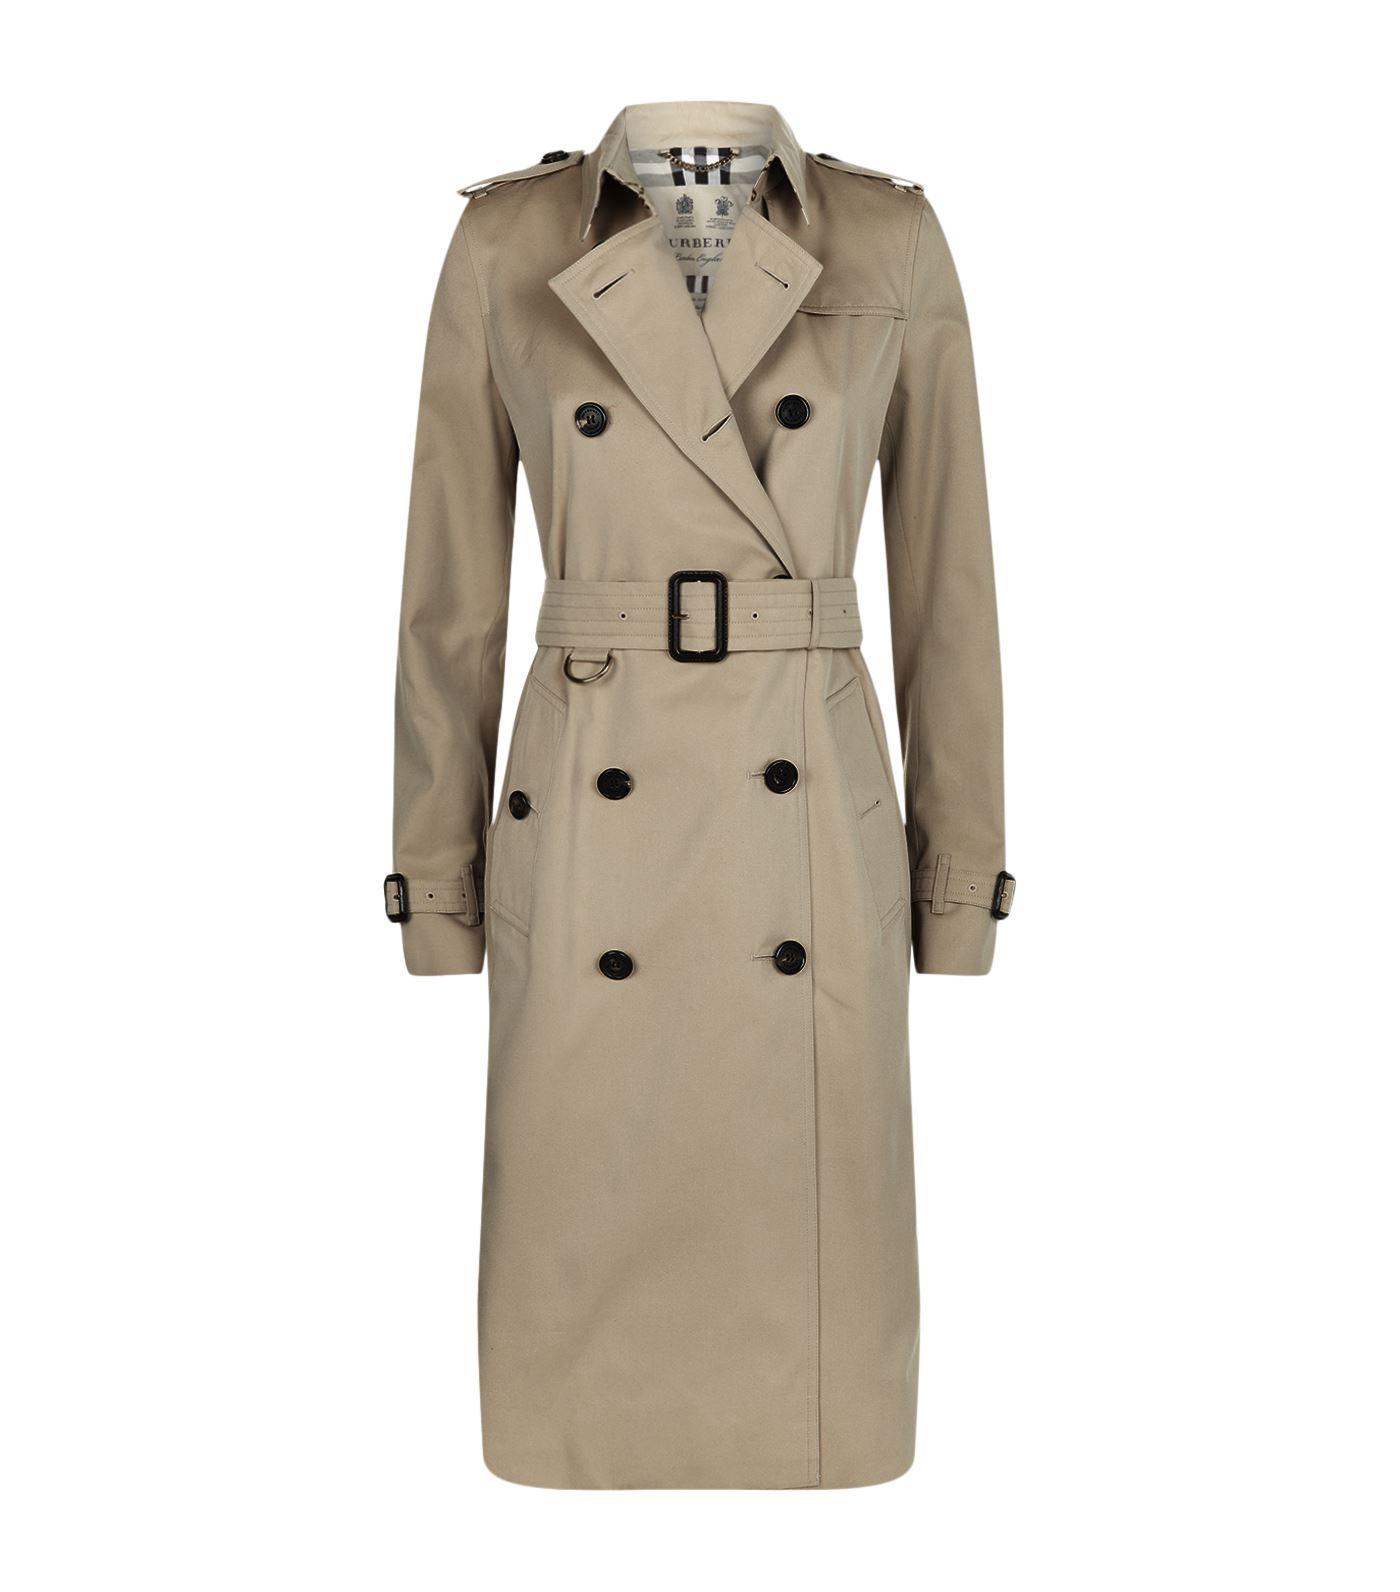 long coats burberry kensington extra long heritage trench coat ... ytuihrk